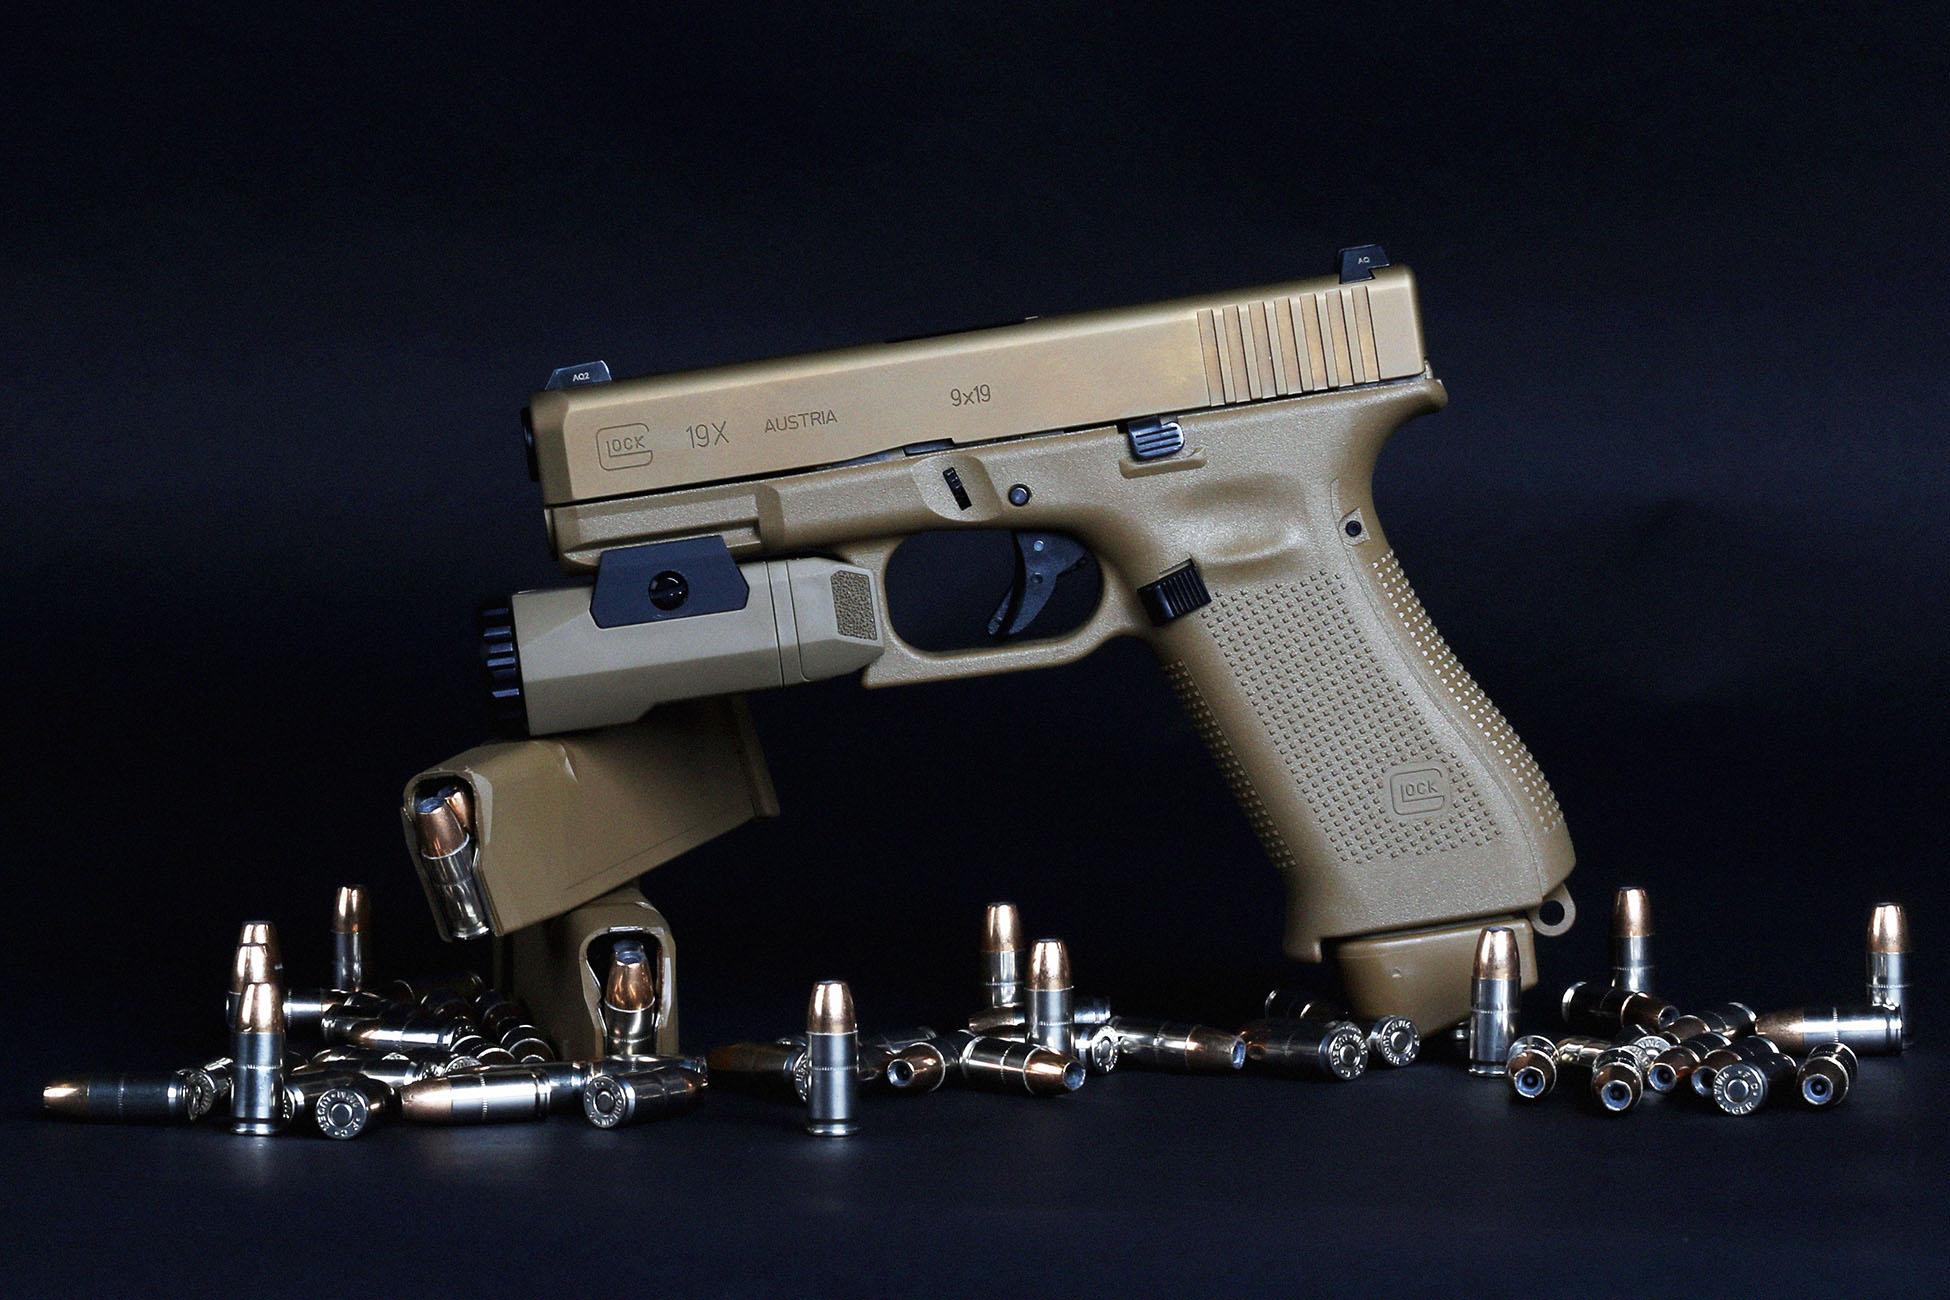 Glock 9mm Pistol in flat dark earth with JHP ammunition